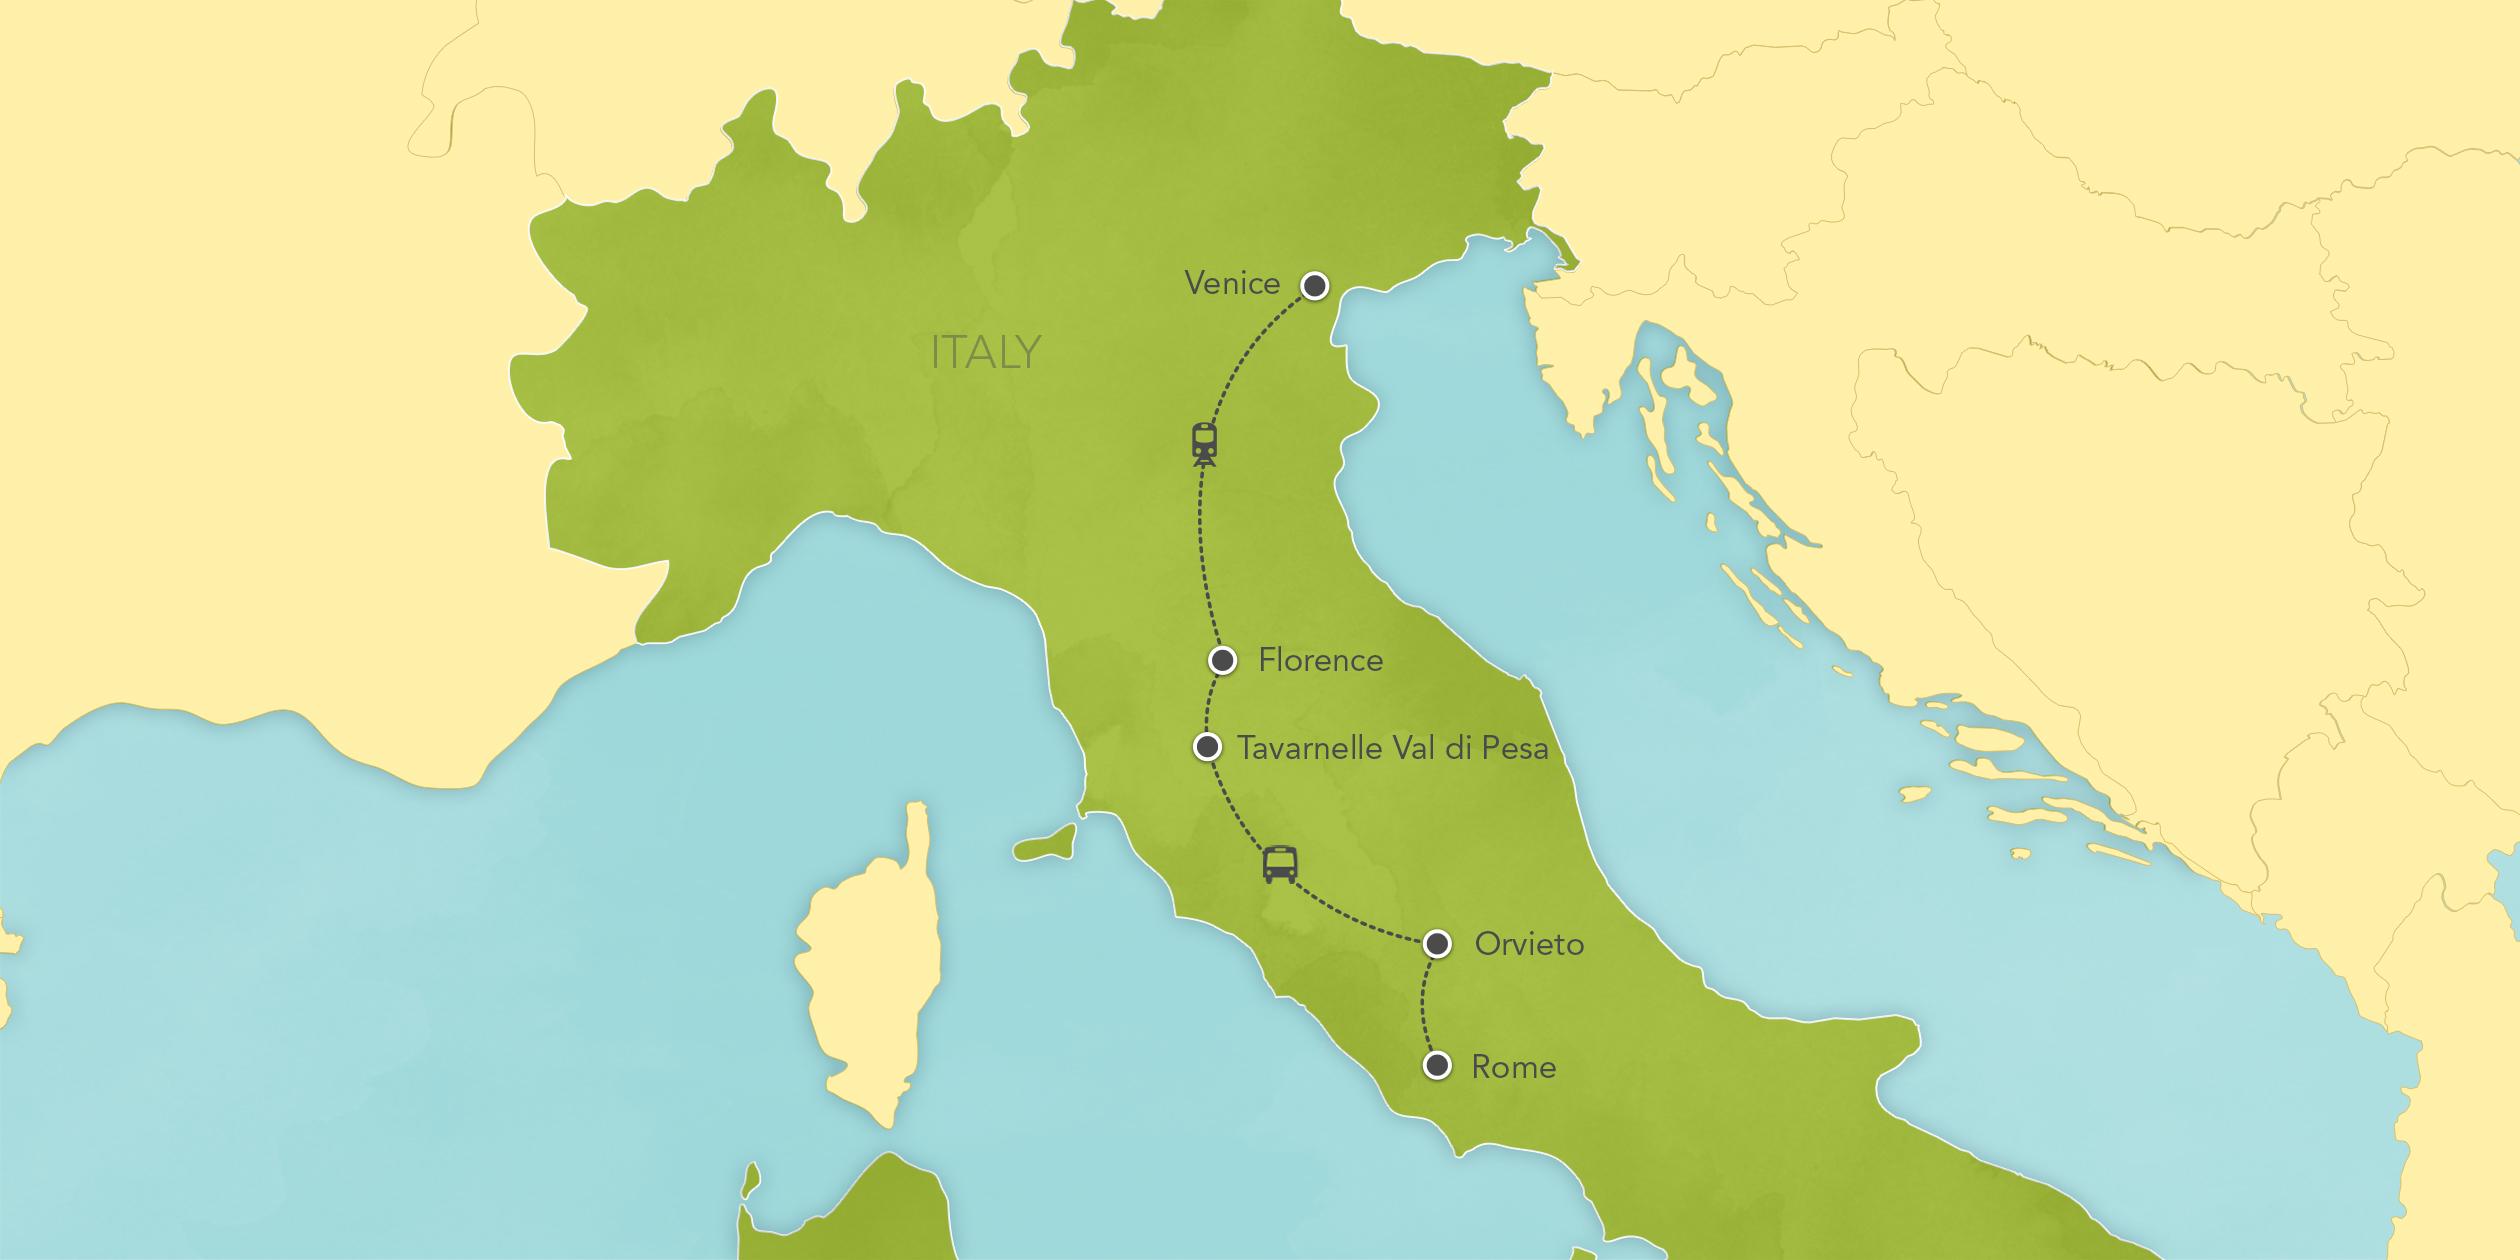 Itinerary map of Italy: Rome, Florence, Tuscany, Venice 2017